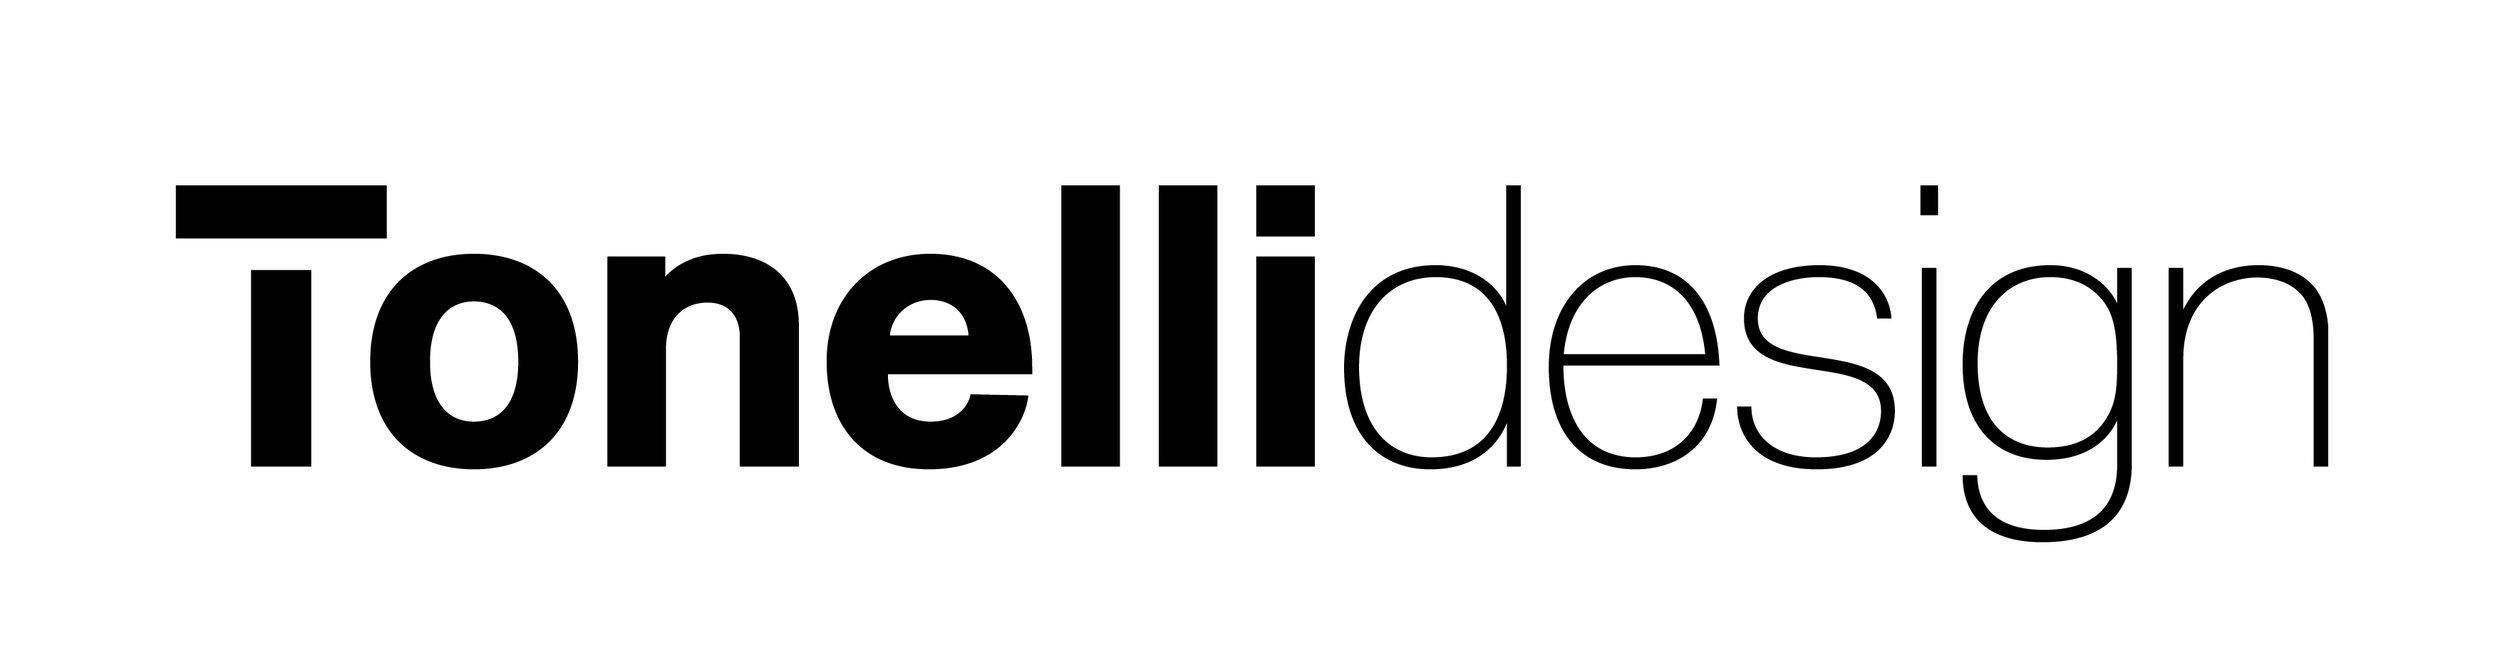 logo tonelli2013.jpg